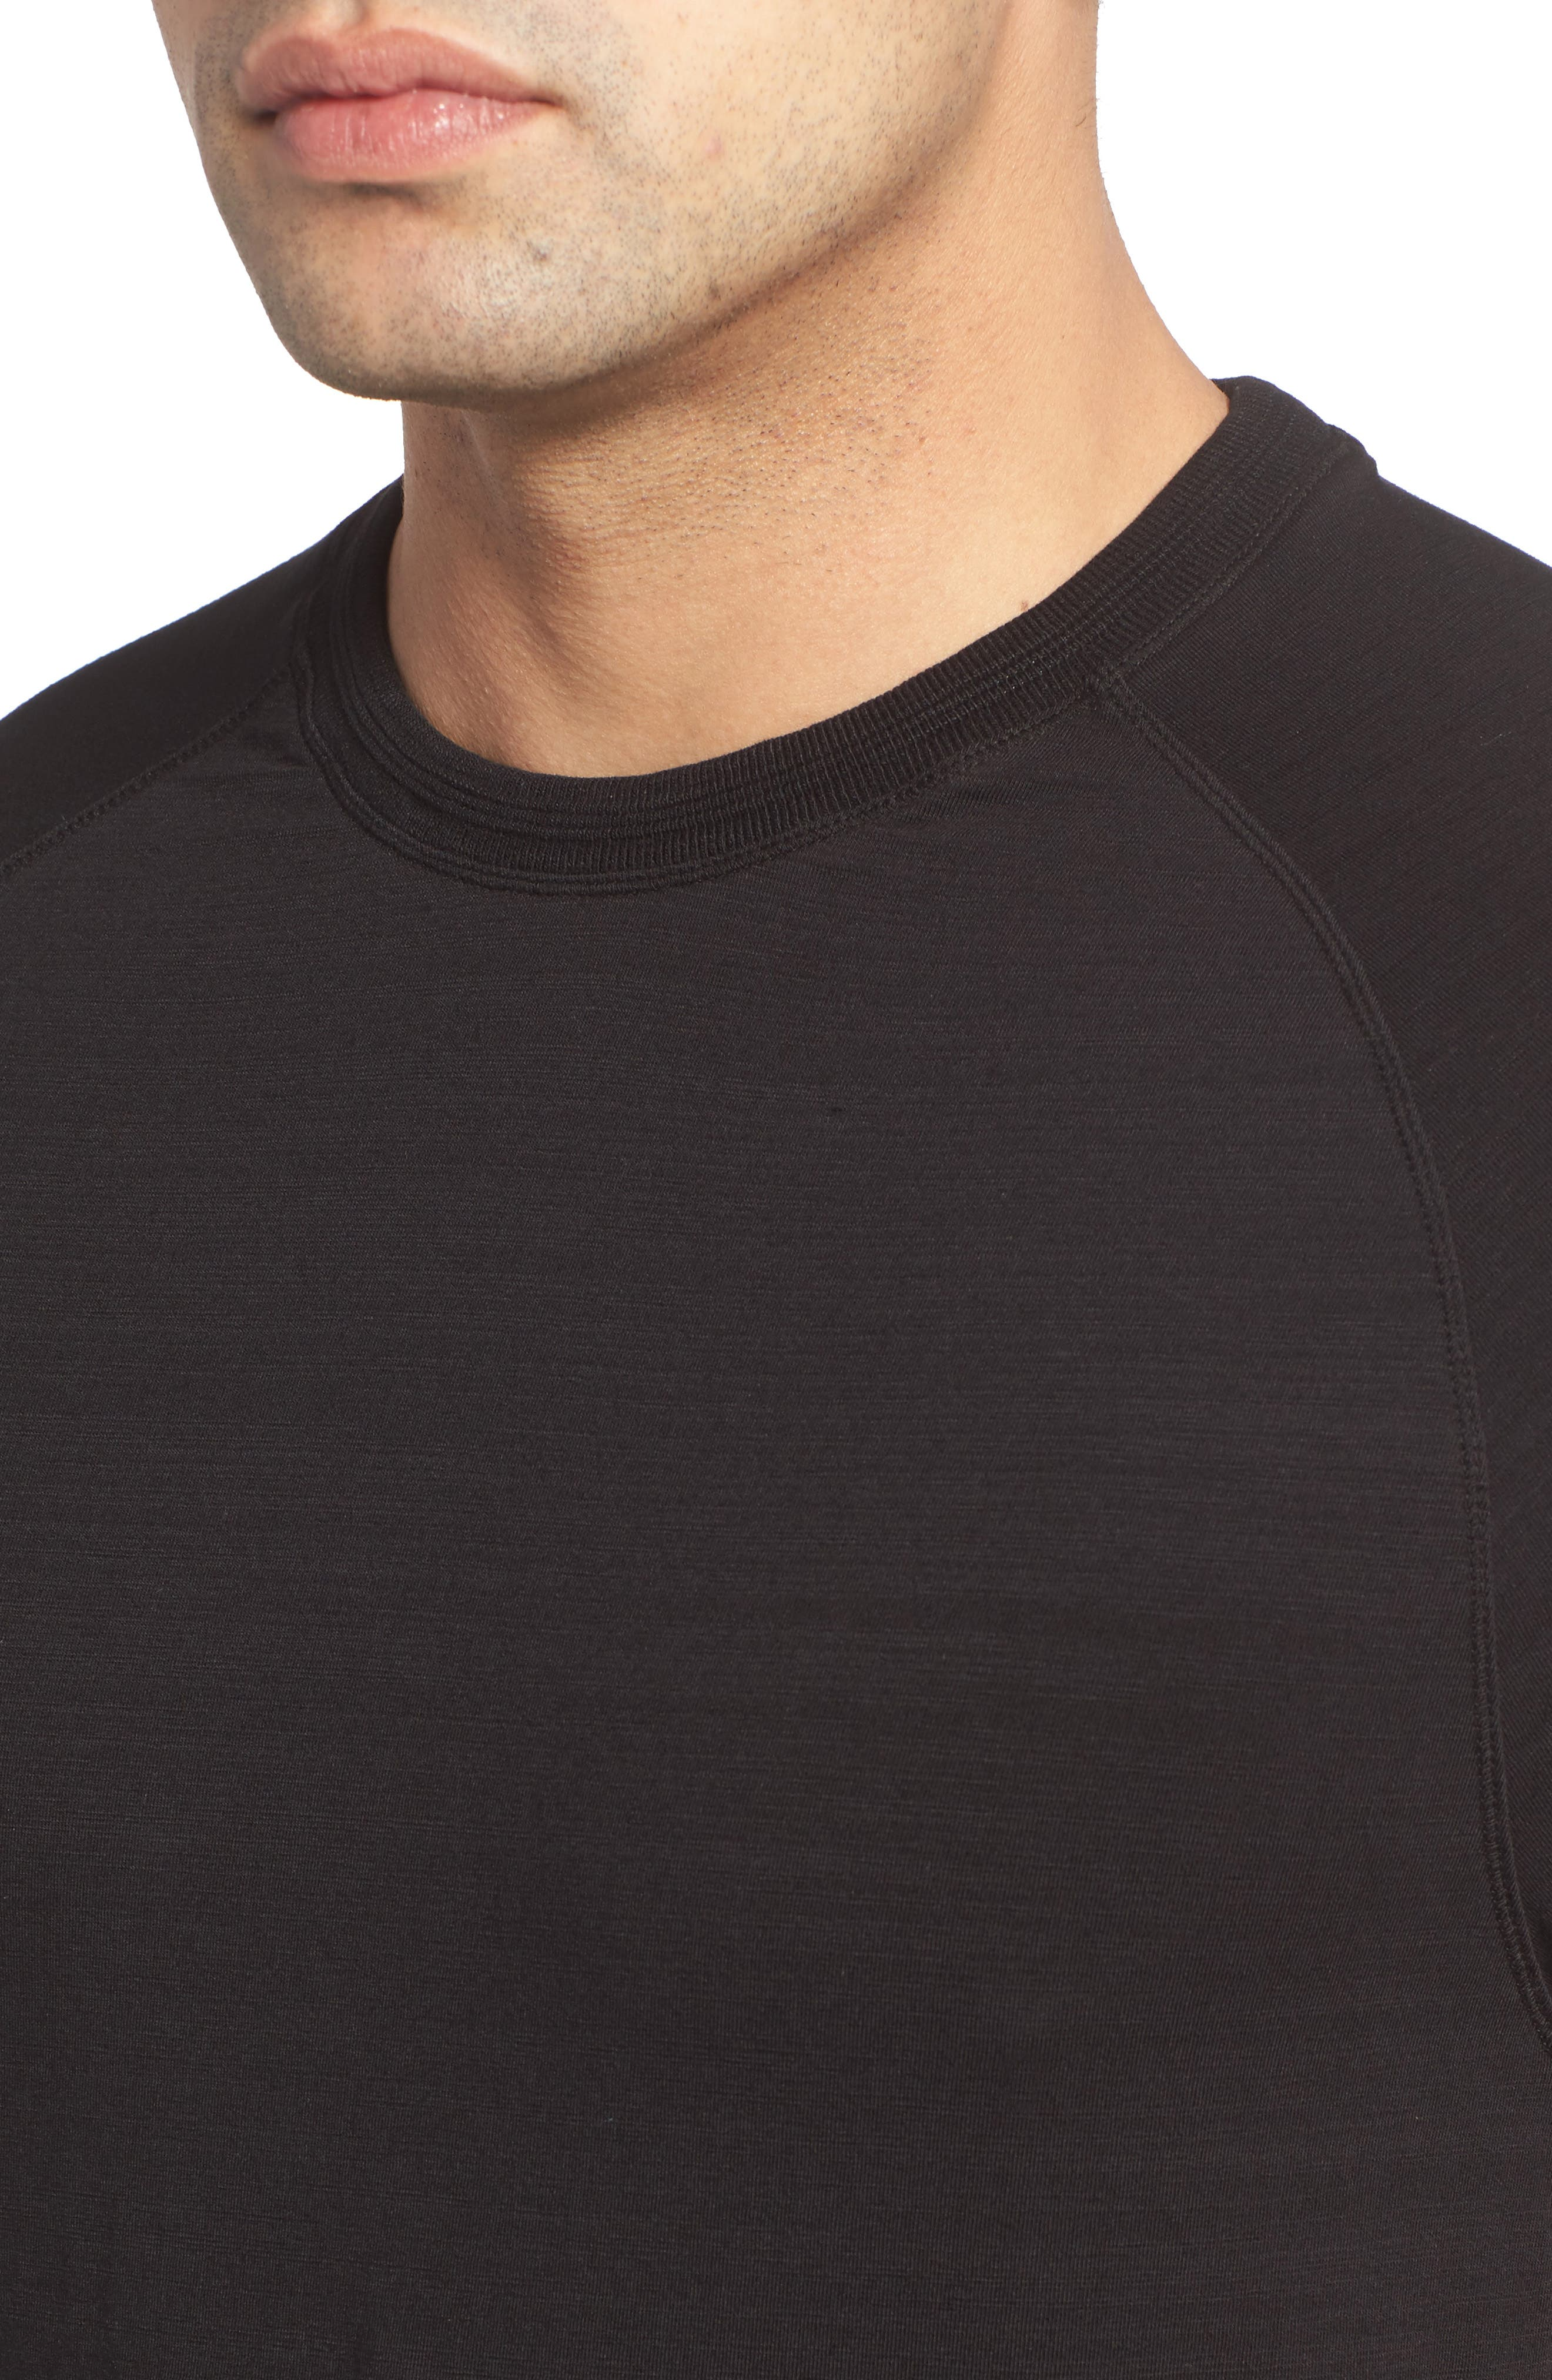 Riggs Stretch Slub Jersey T-Shirt,                             Alternate thumbnail 4, color,                             001